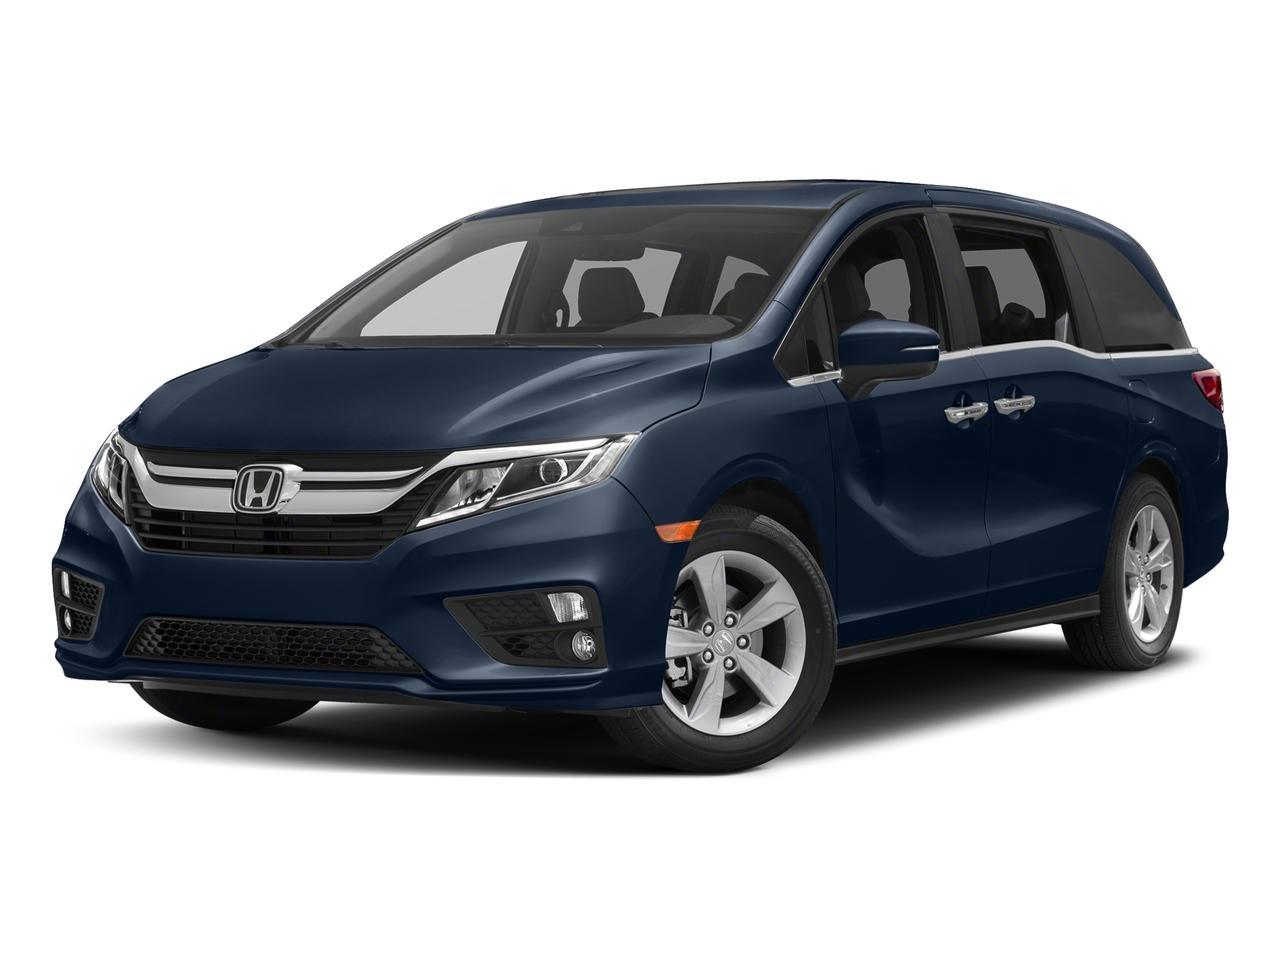 2018 Honda Odyssey Vehicle Photo in Rockville, MD 20852